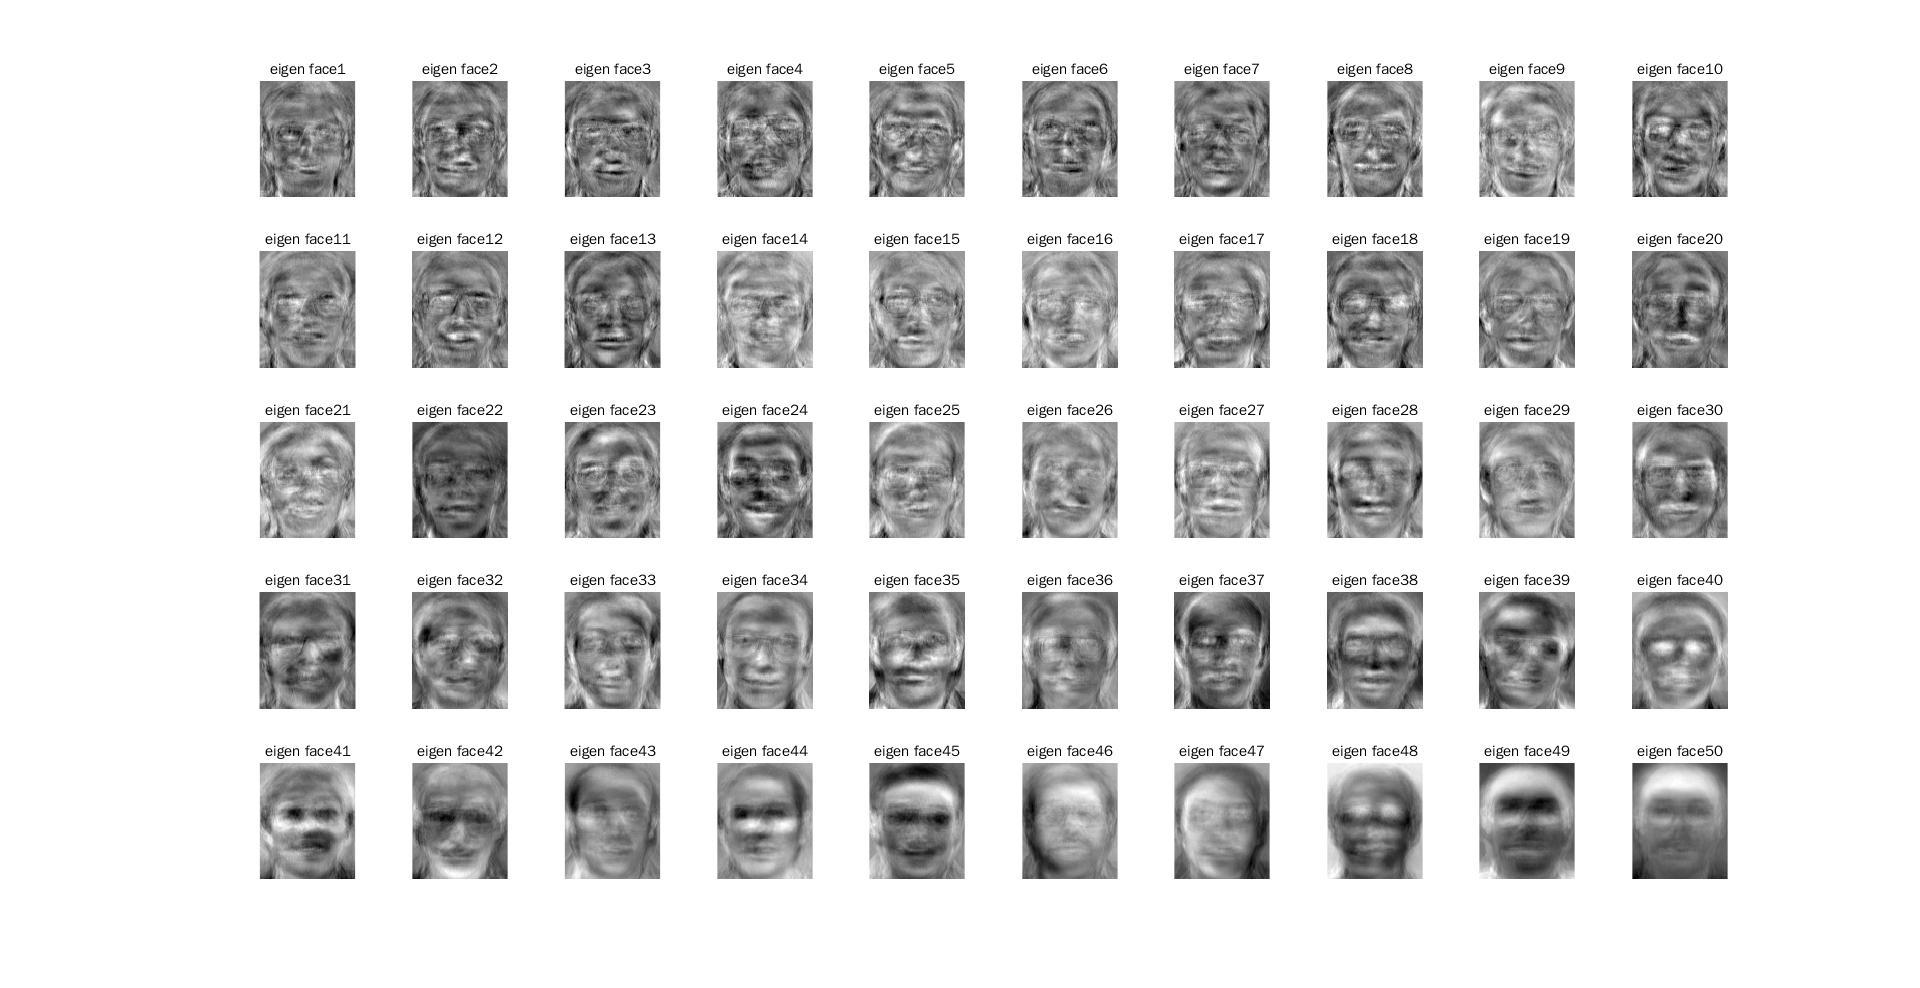 eigen_faces.jpg